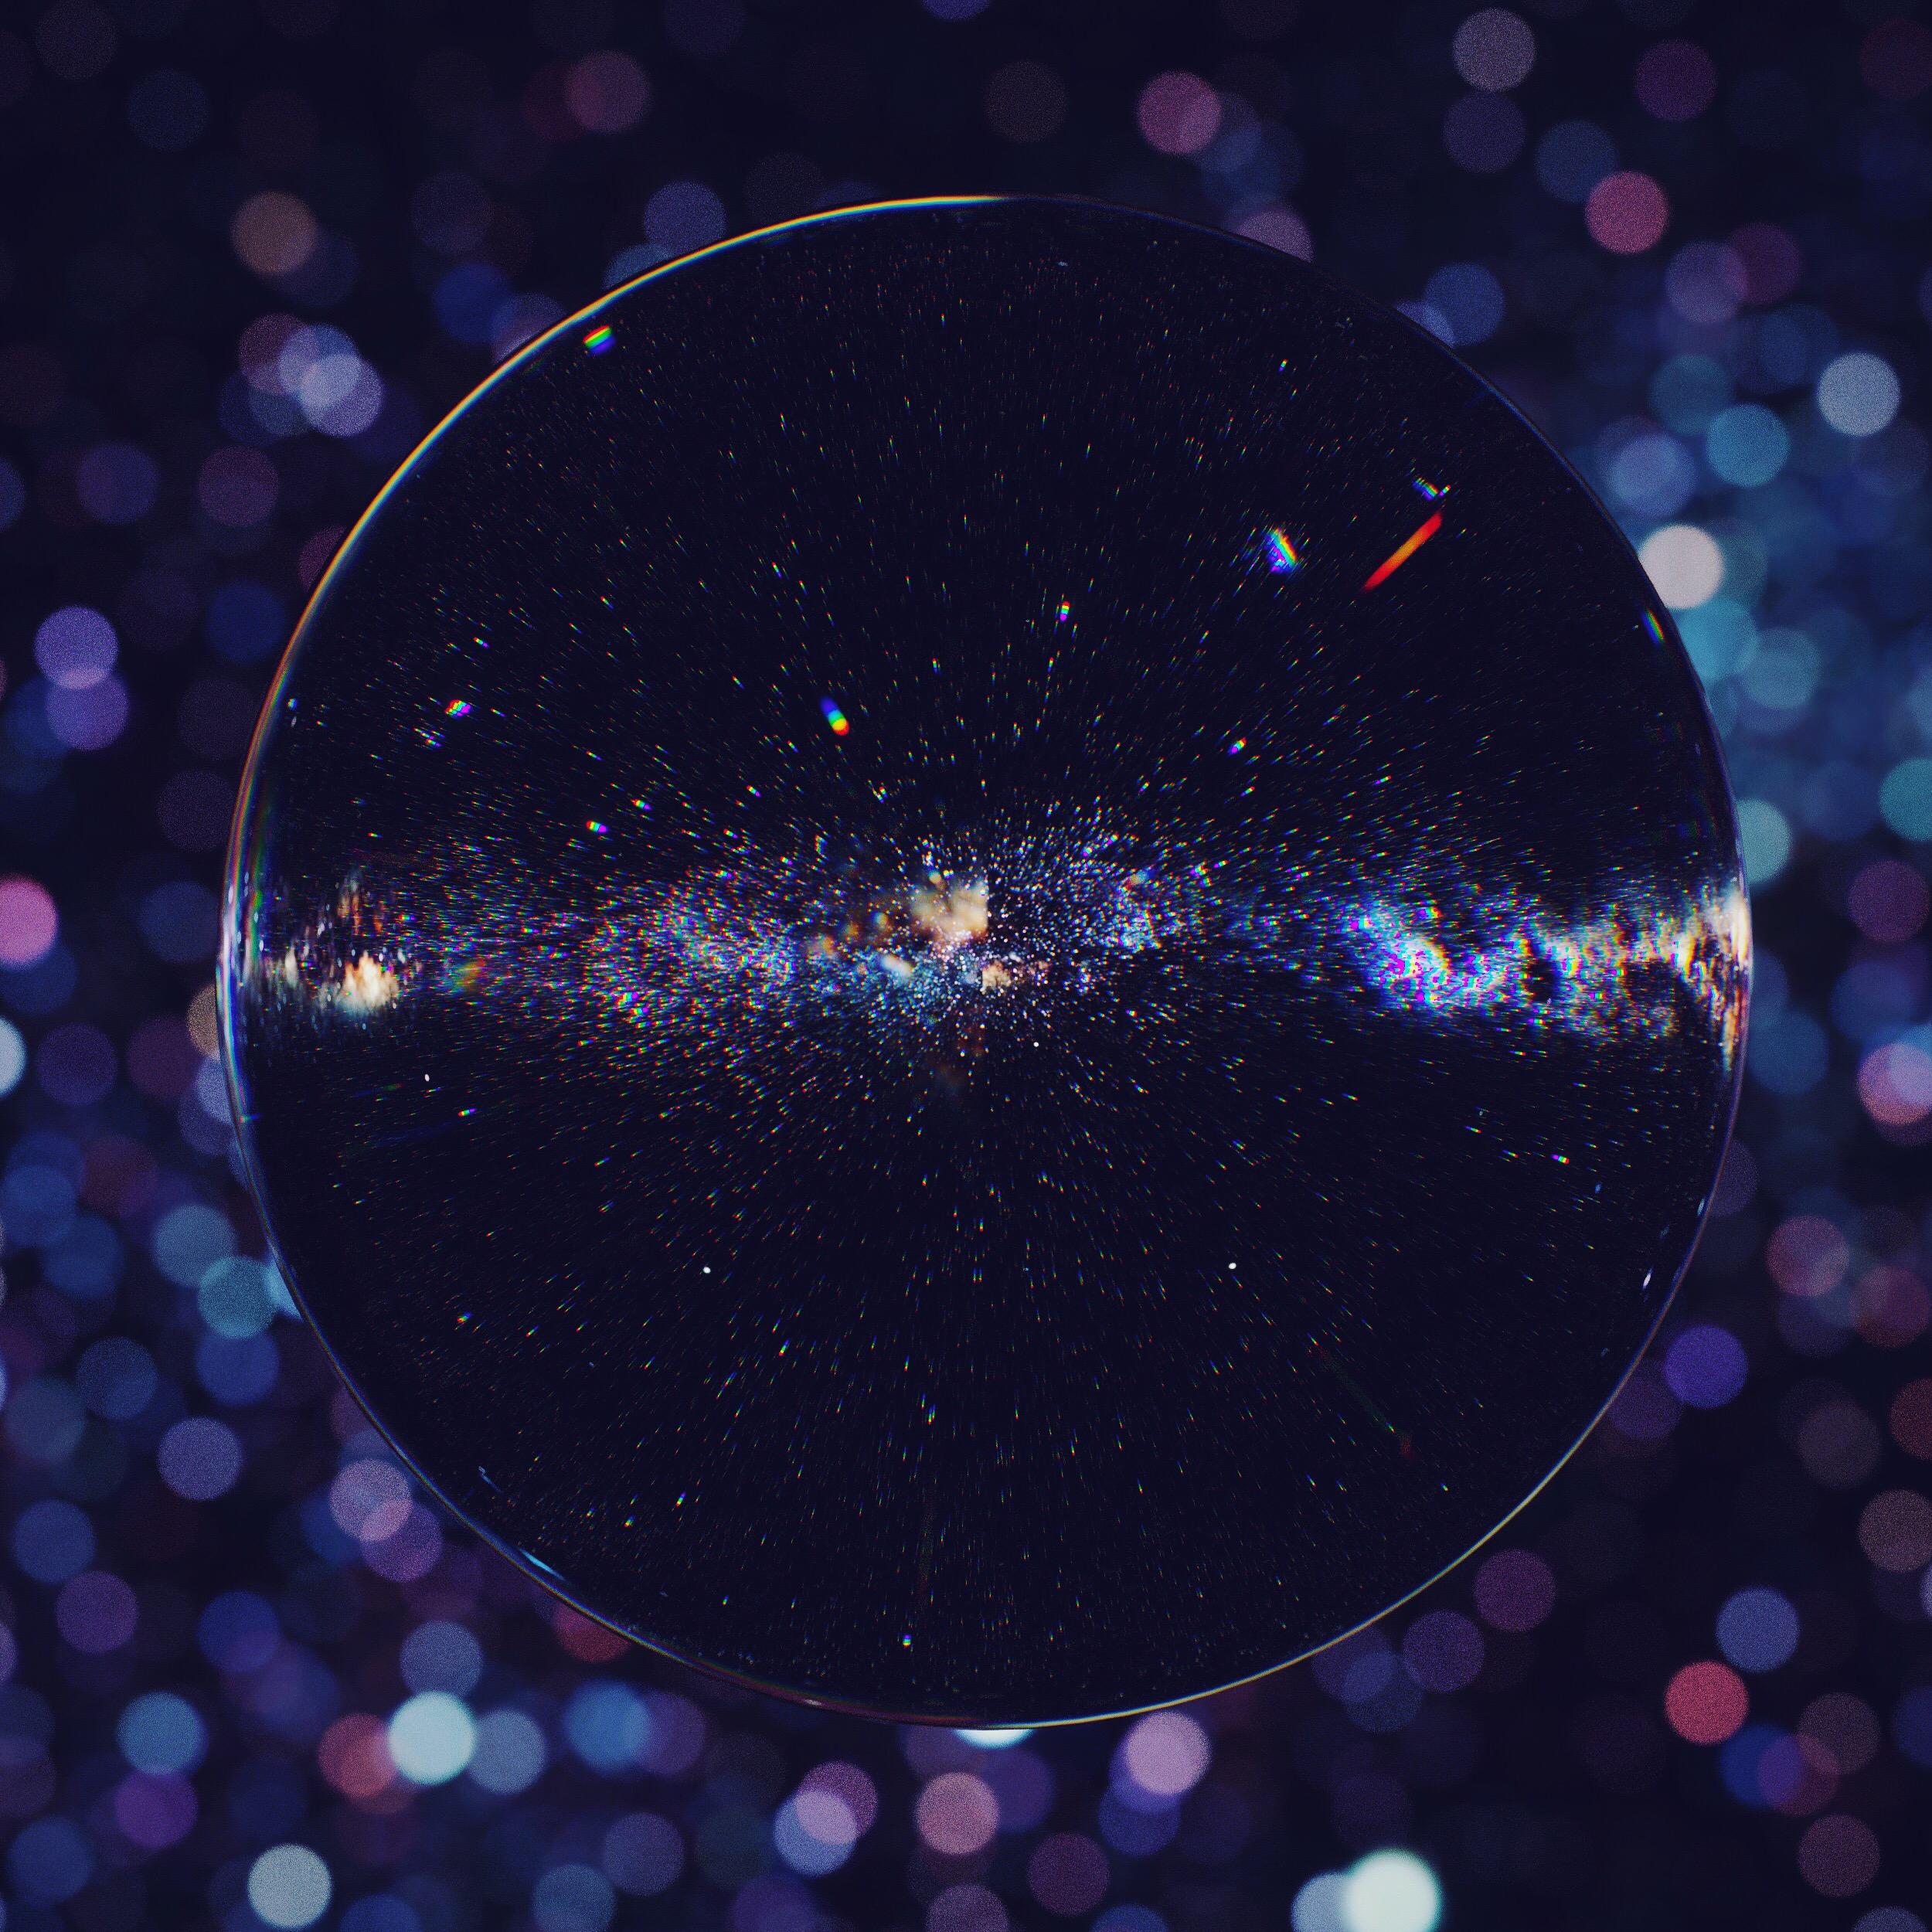 010417_Time_Bubble.jpeg